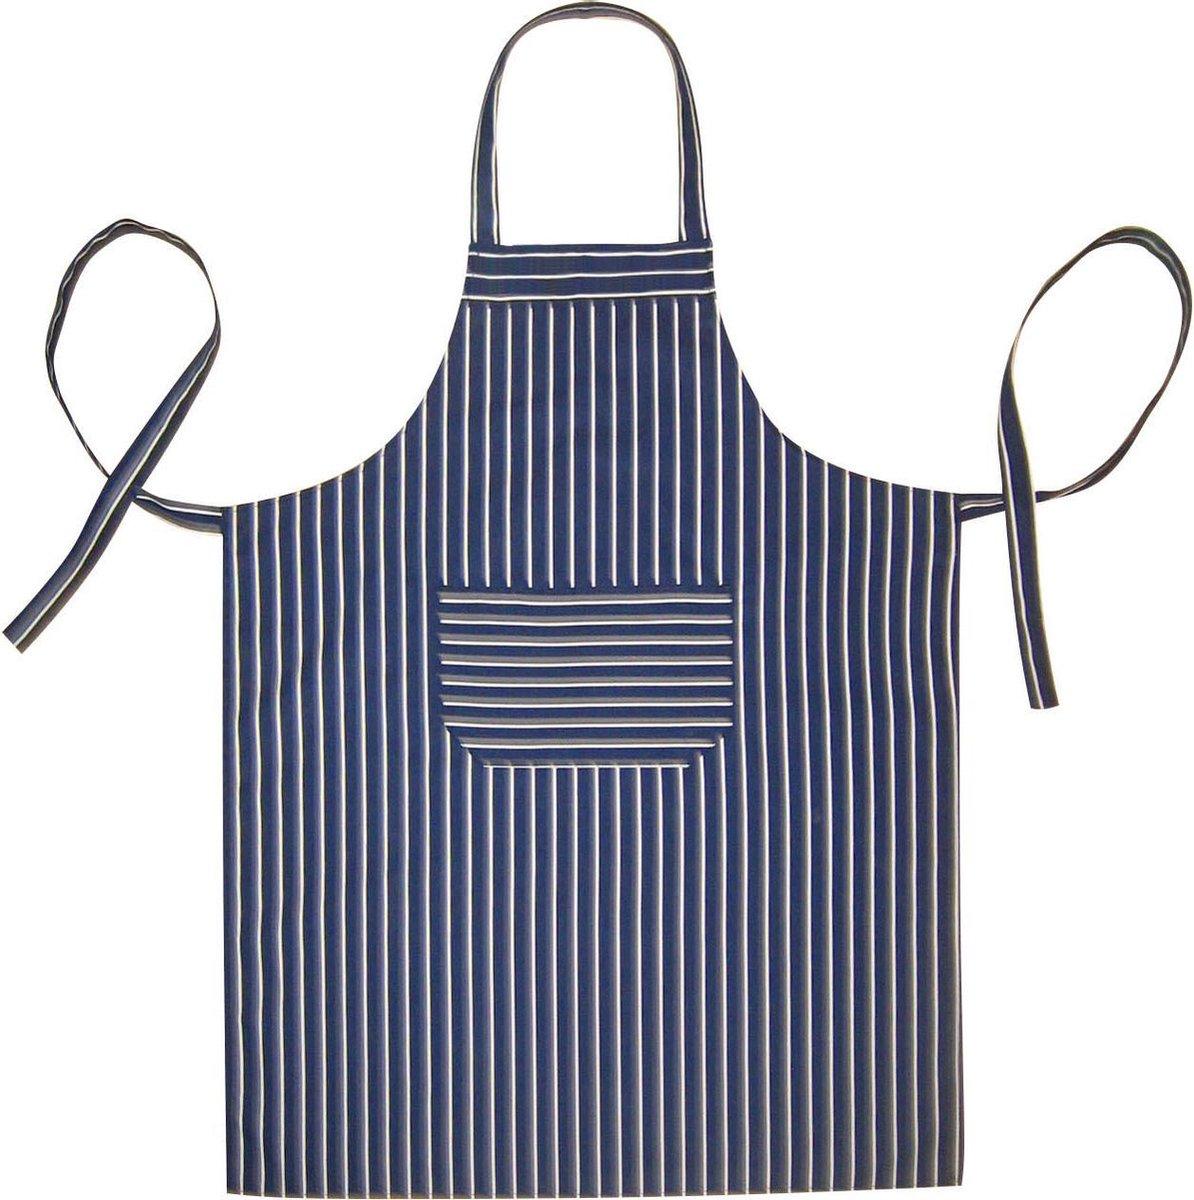 Homéé® Horeca suite Keukenschorten BBQ BIB Apron - blauwe streep - 70x100 cm - 2 stuks